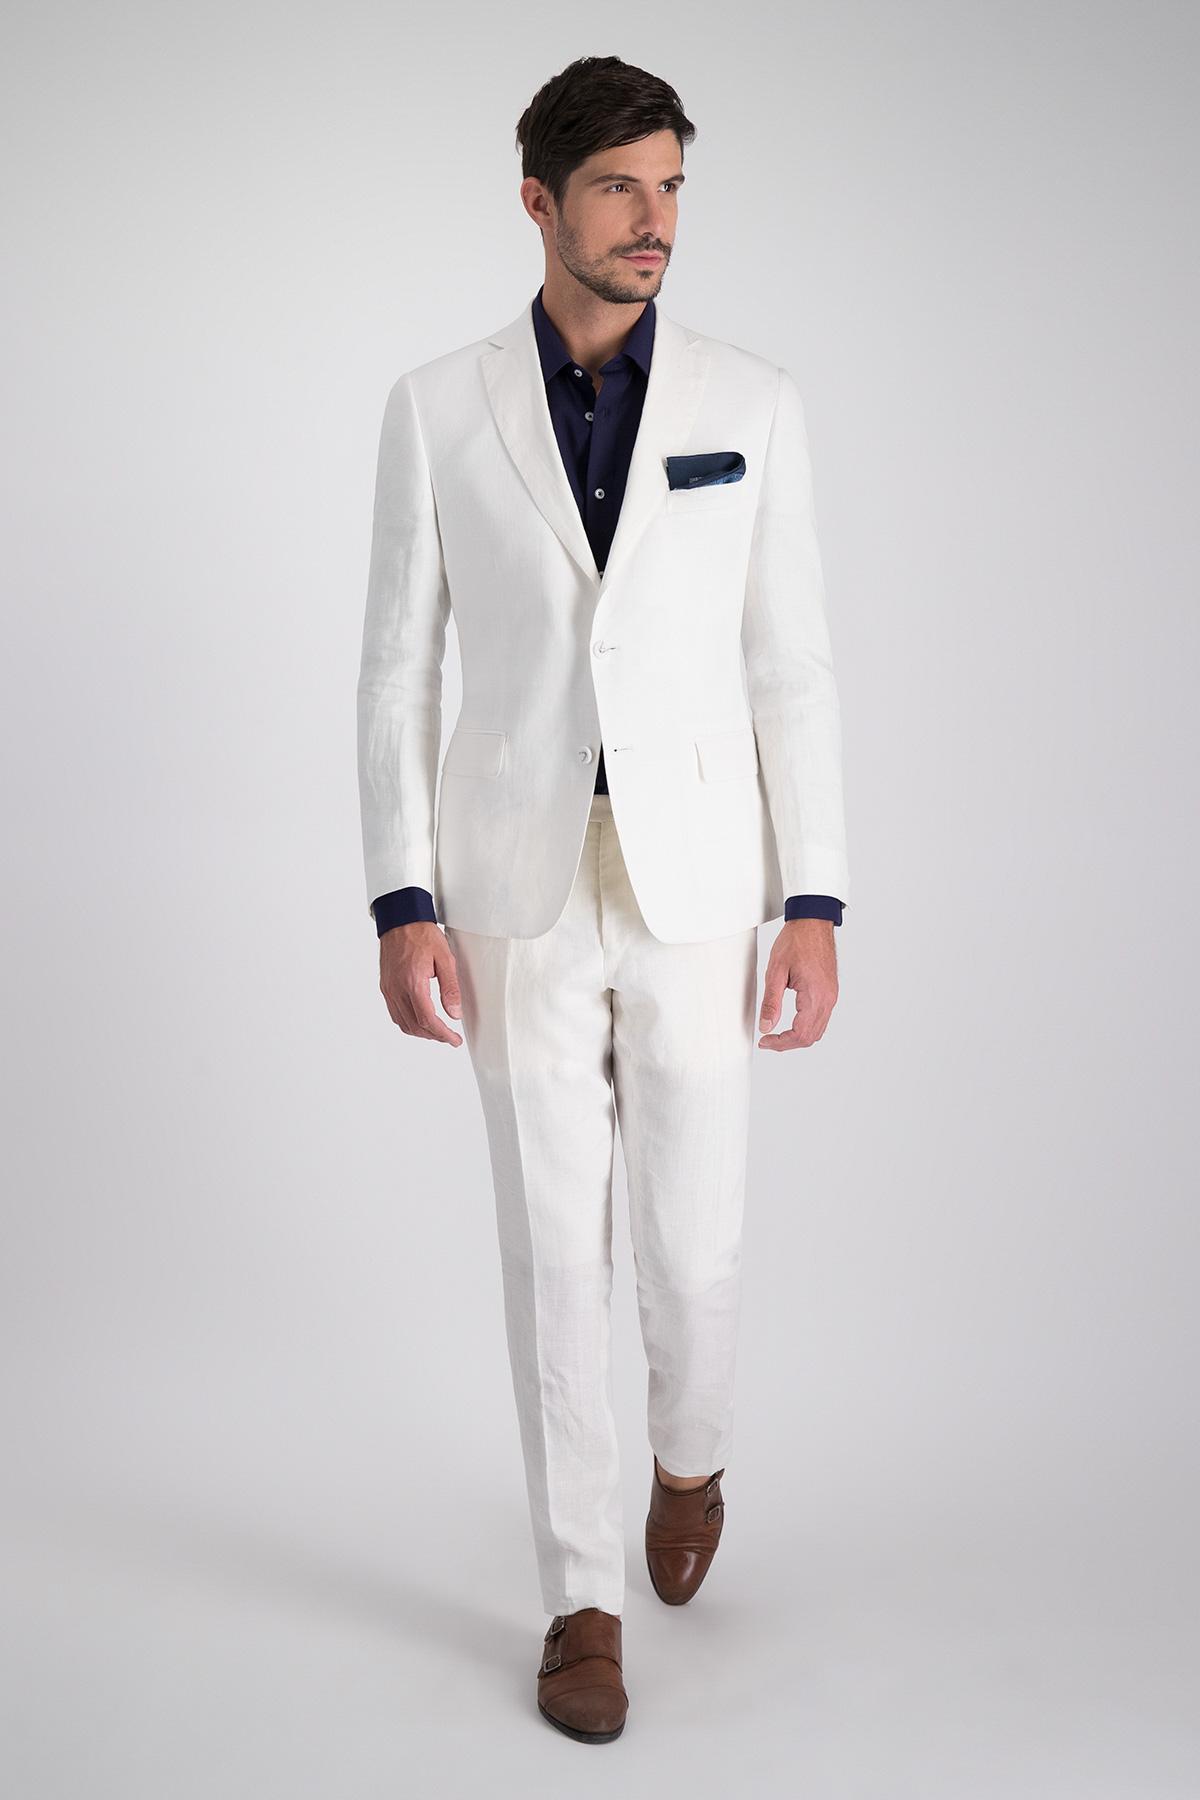 Traje marca HIGH LIFE tejido de lino blanco